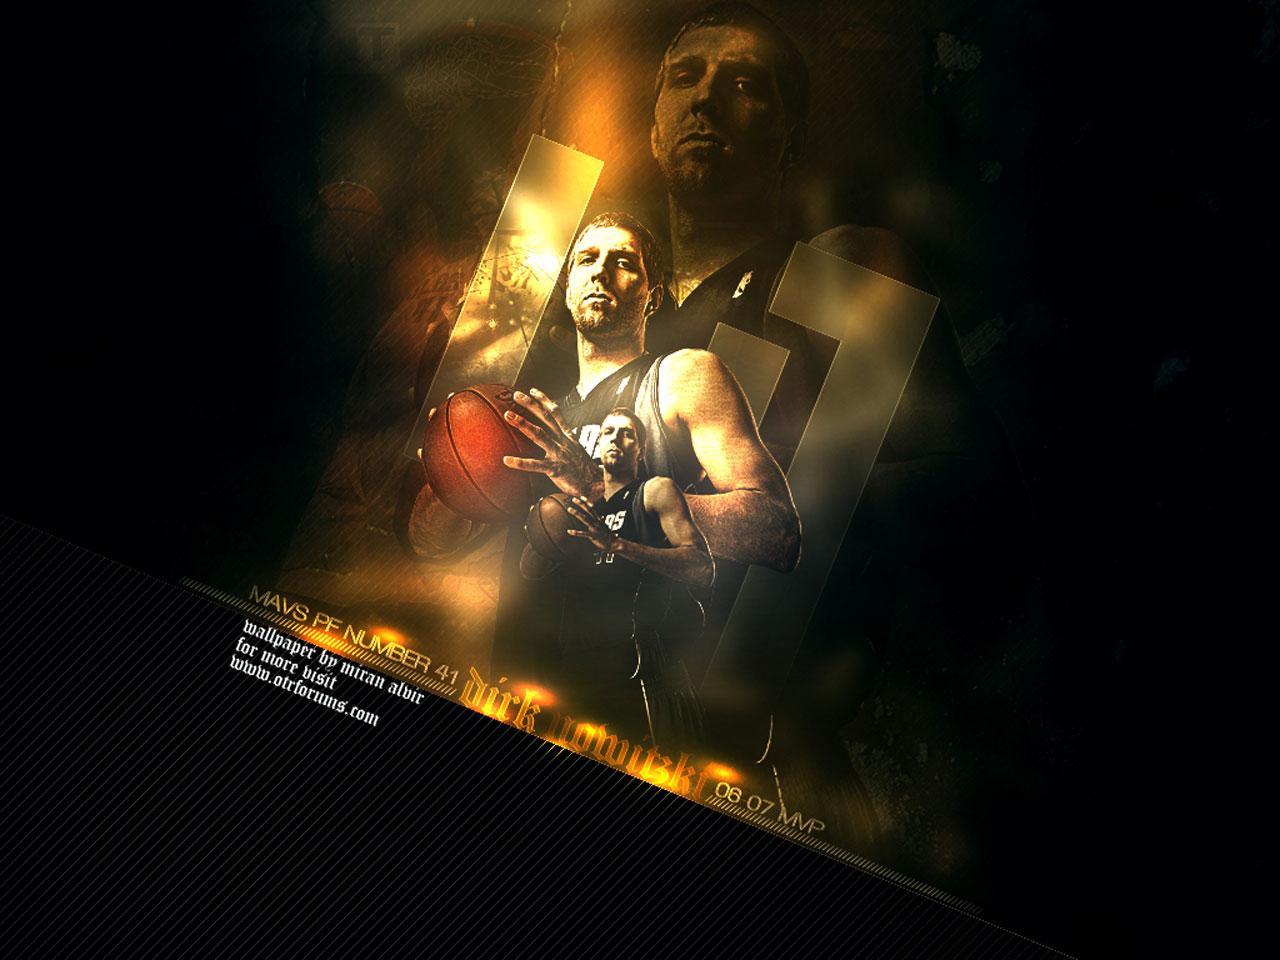 http://4.bp.blogspot.com/-Z4EiDCEkfKg/TdUGCiNIs_I/AAAAAAAAAPI/ZQuHwS74pNg/s1600/Dirk-Nowitzki-Mavs-Wallpaper.jpg